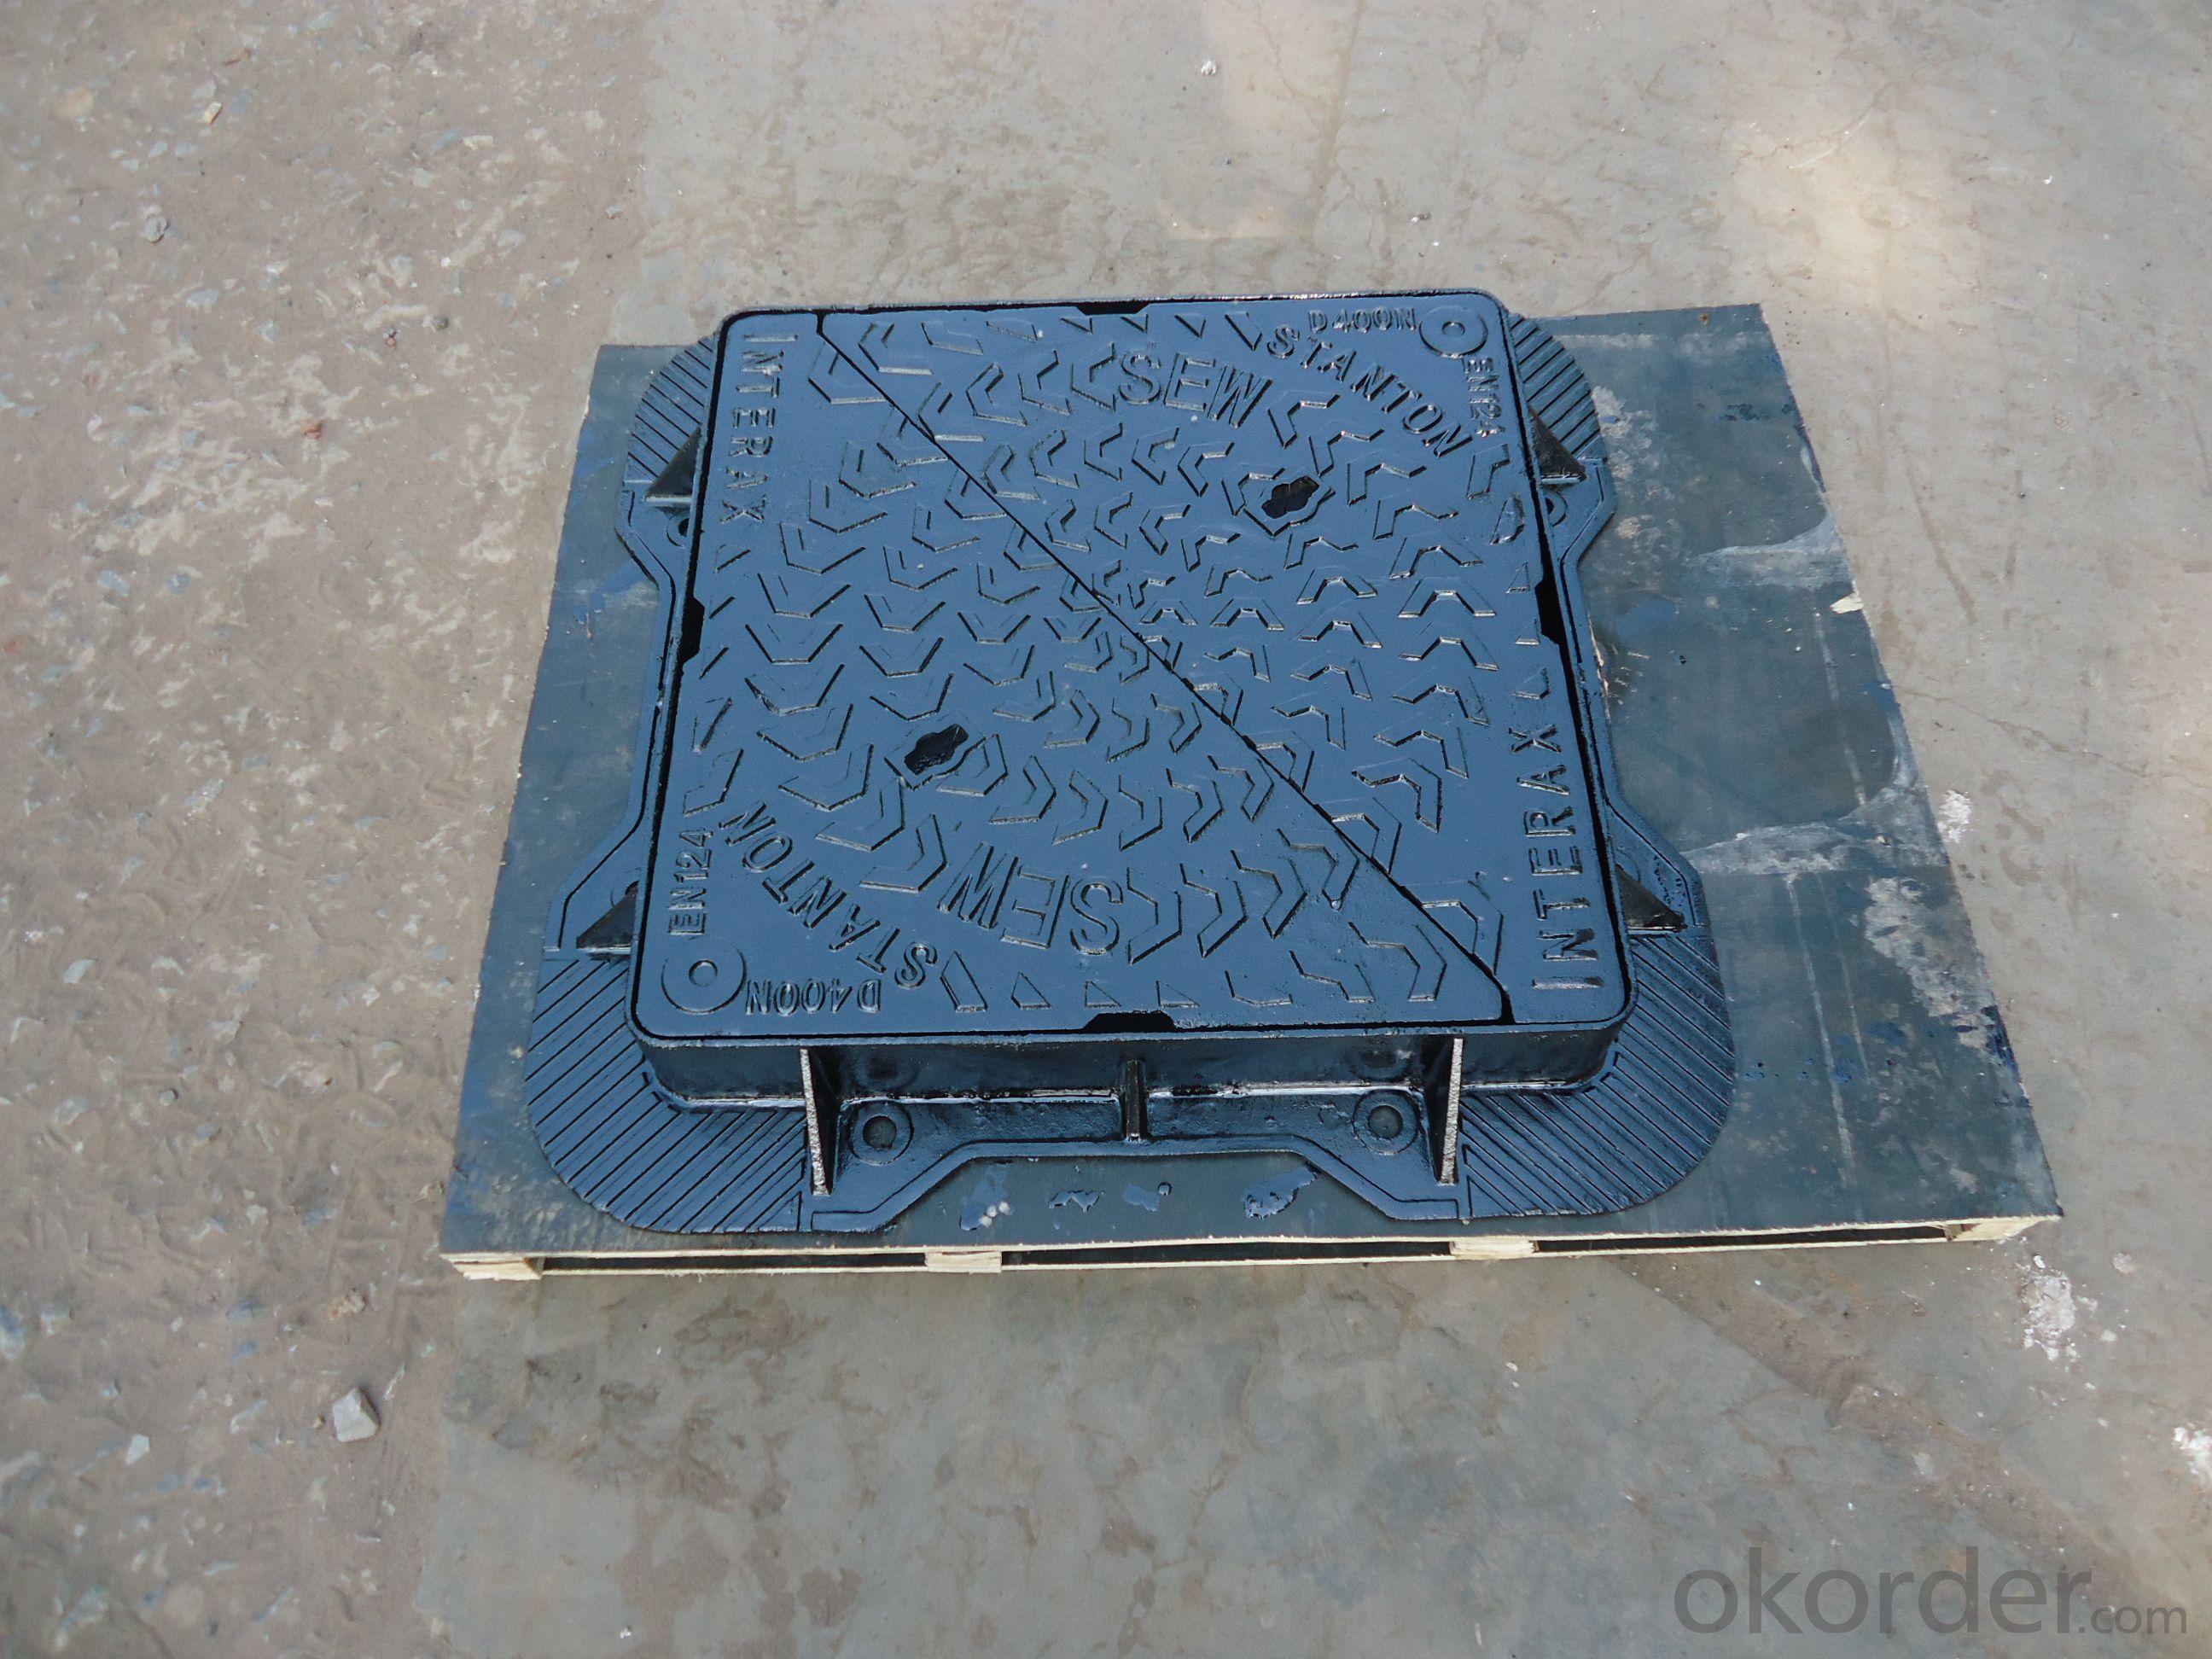 Ductile composite manhole cover